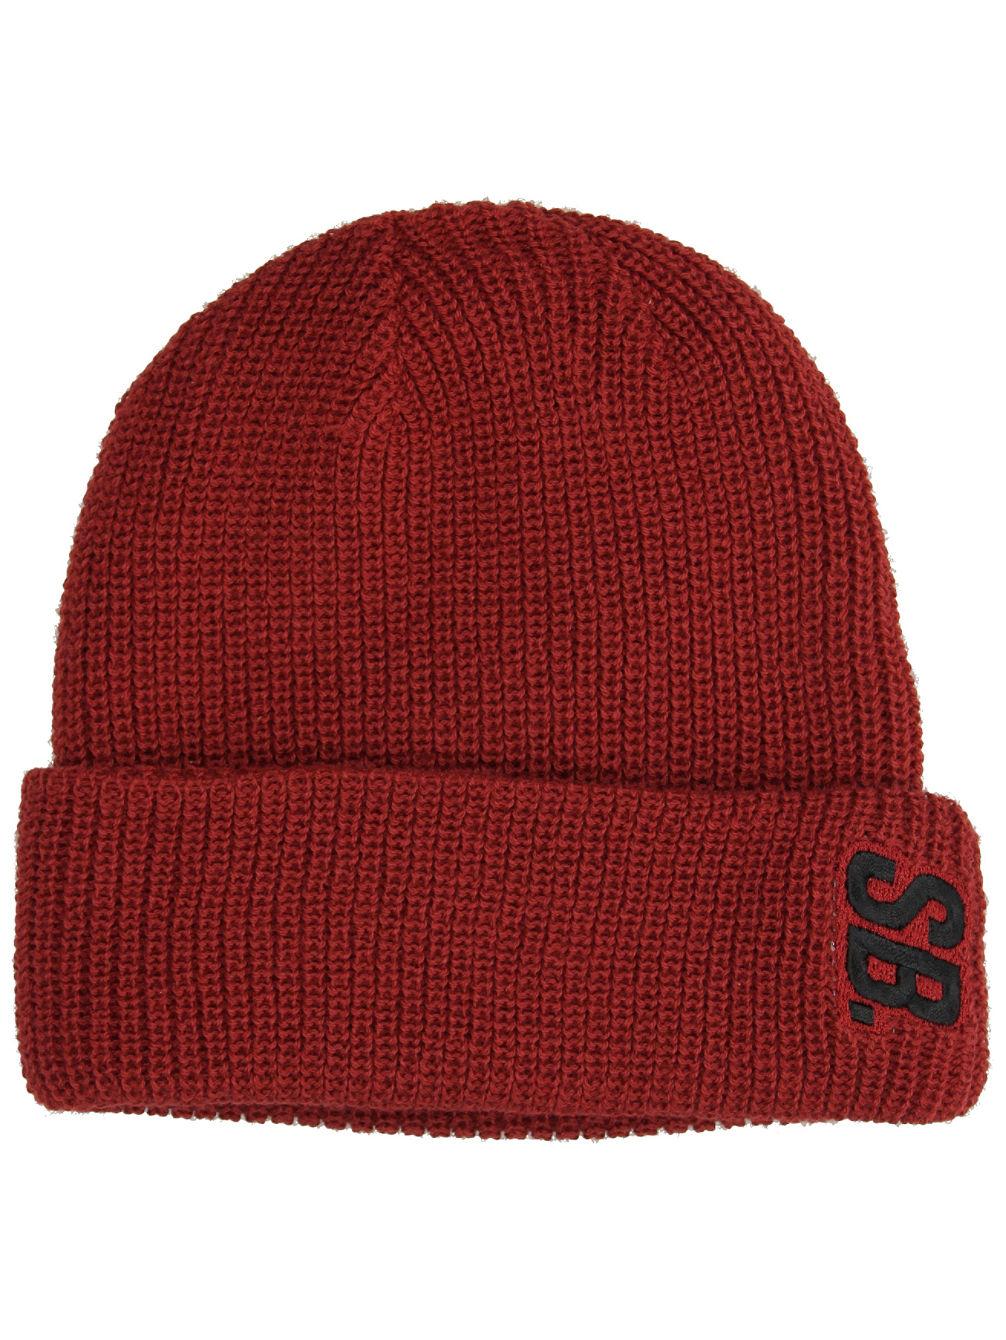 Buy Nike SB Surplus Beanie online at blue-tomato.com c4f09e22f737